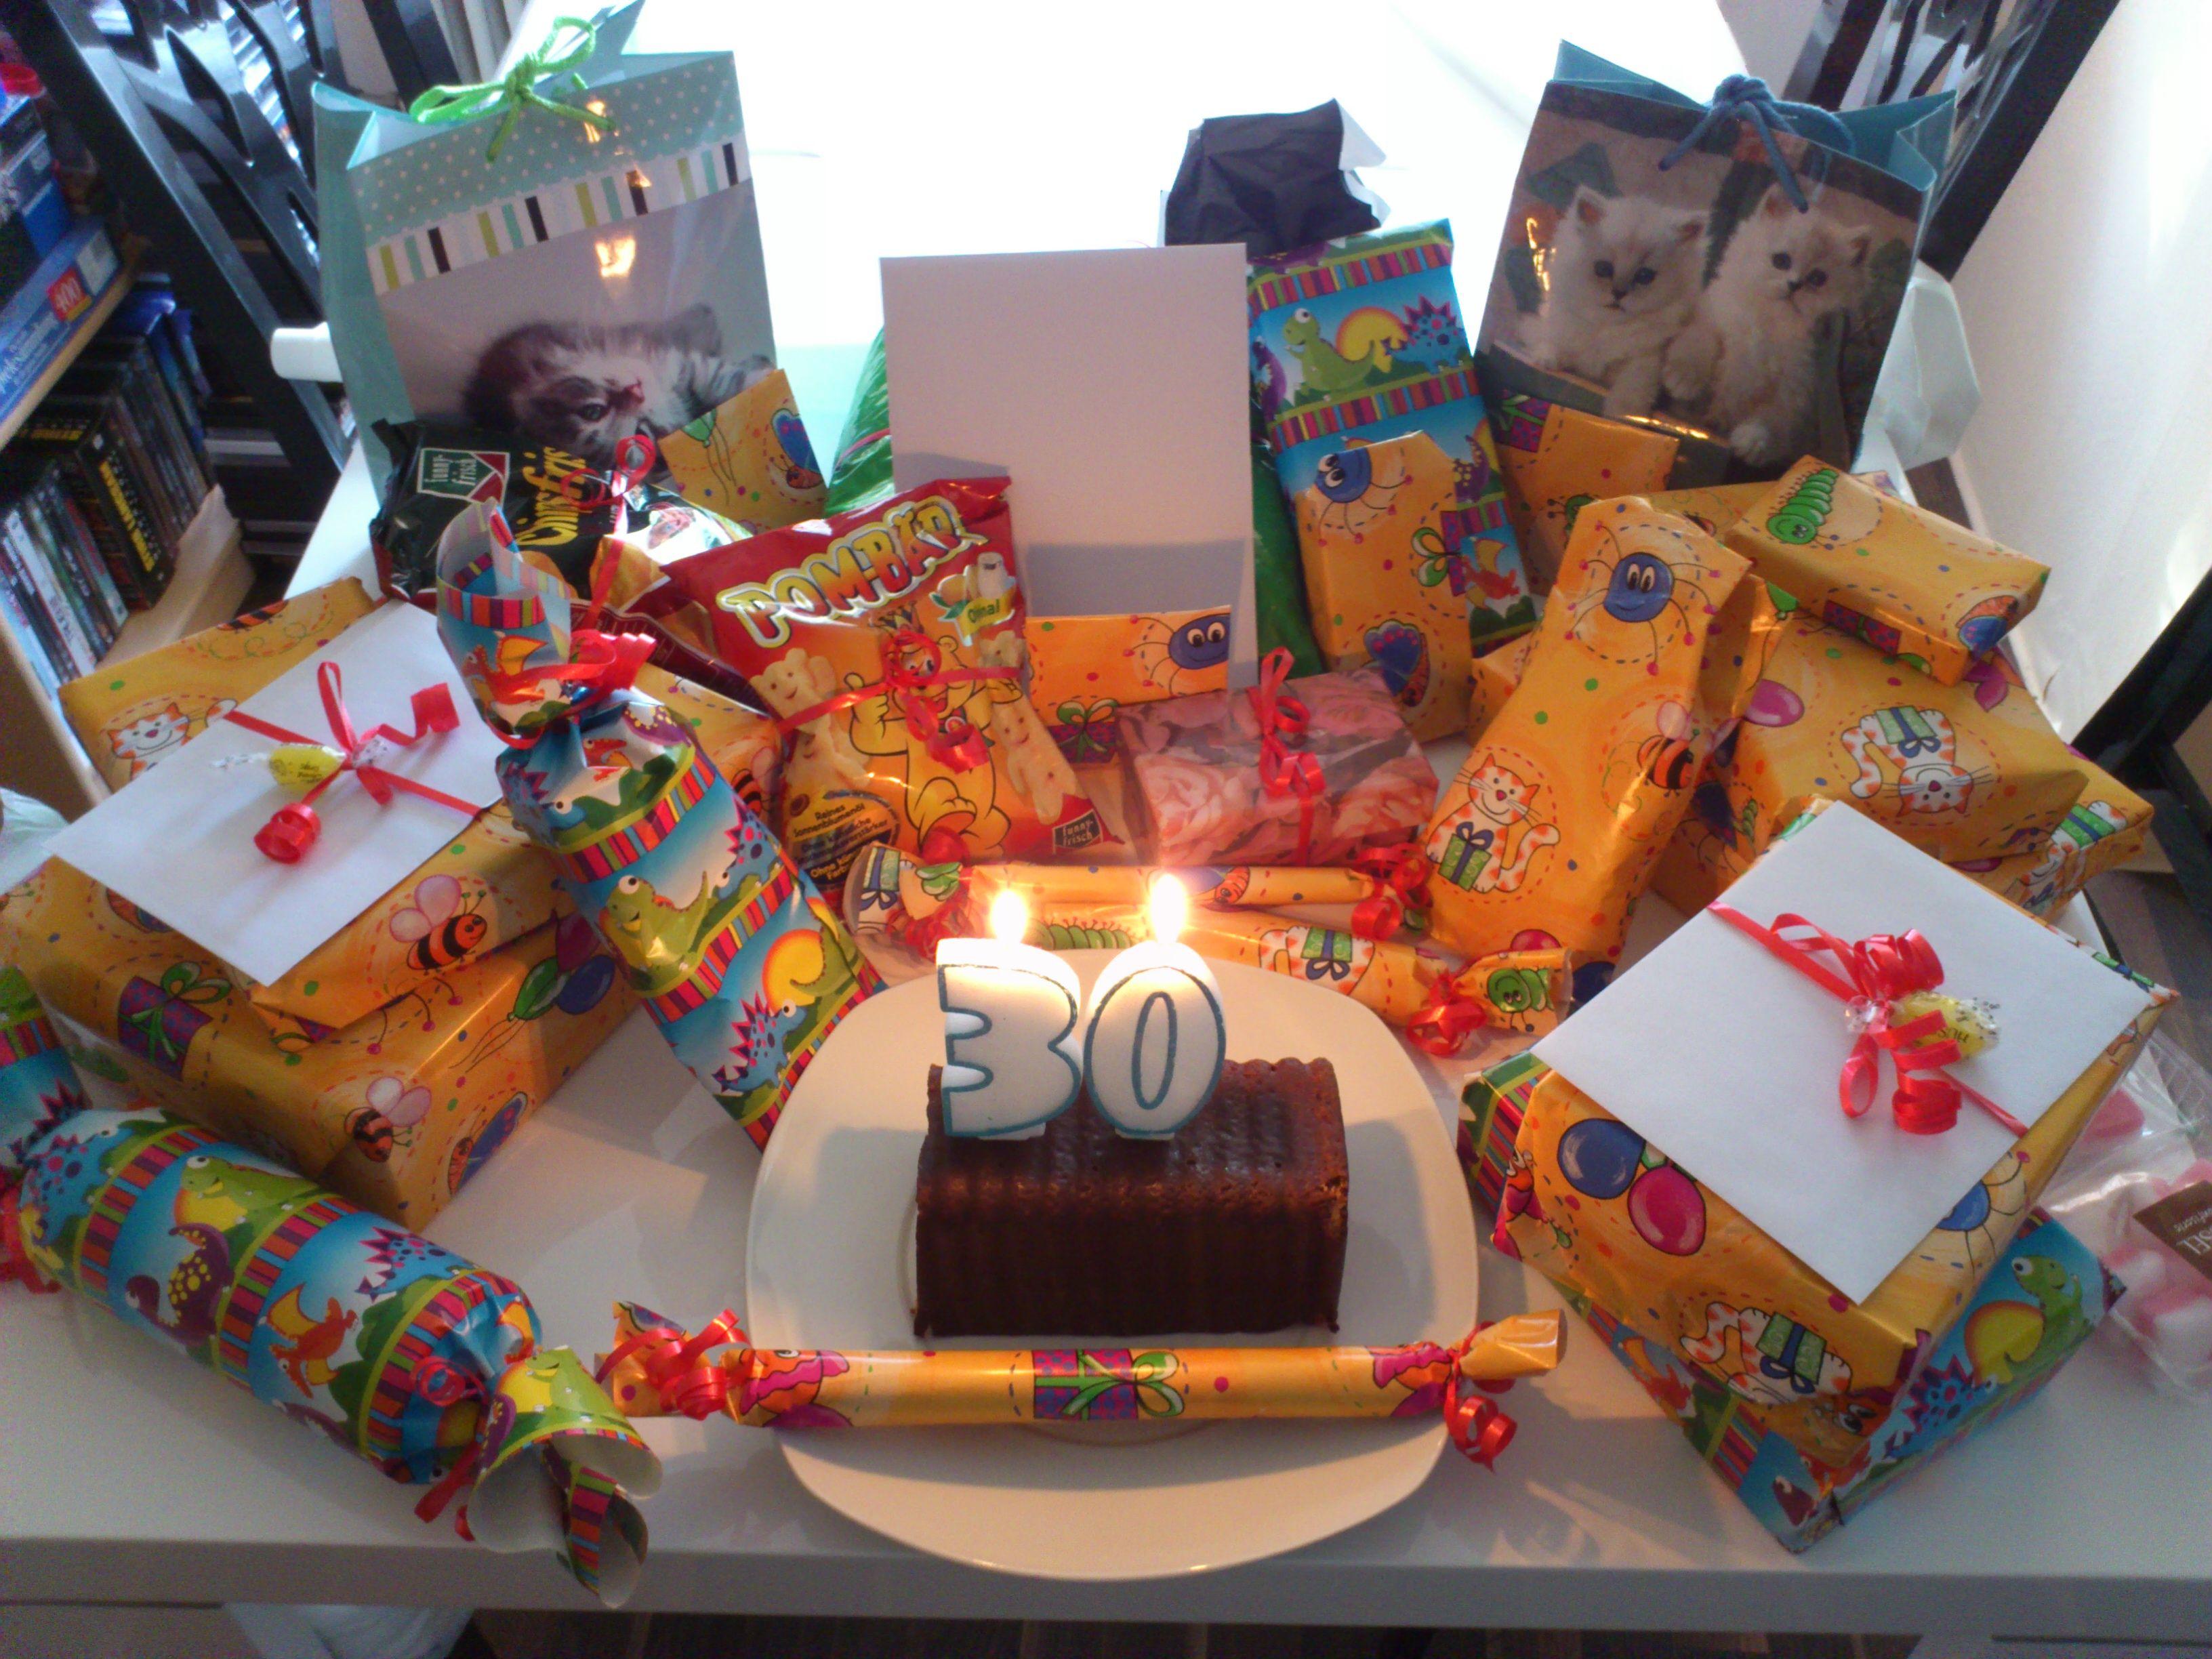 30 Geschenke Zum 30 Geburtstag Geschenke Zum 30 Geschenke